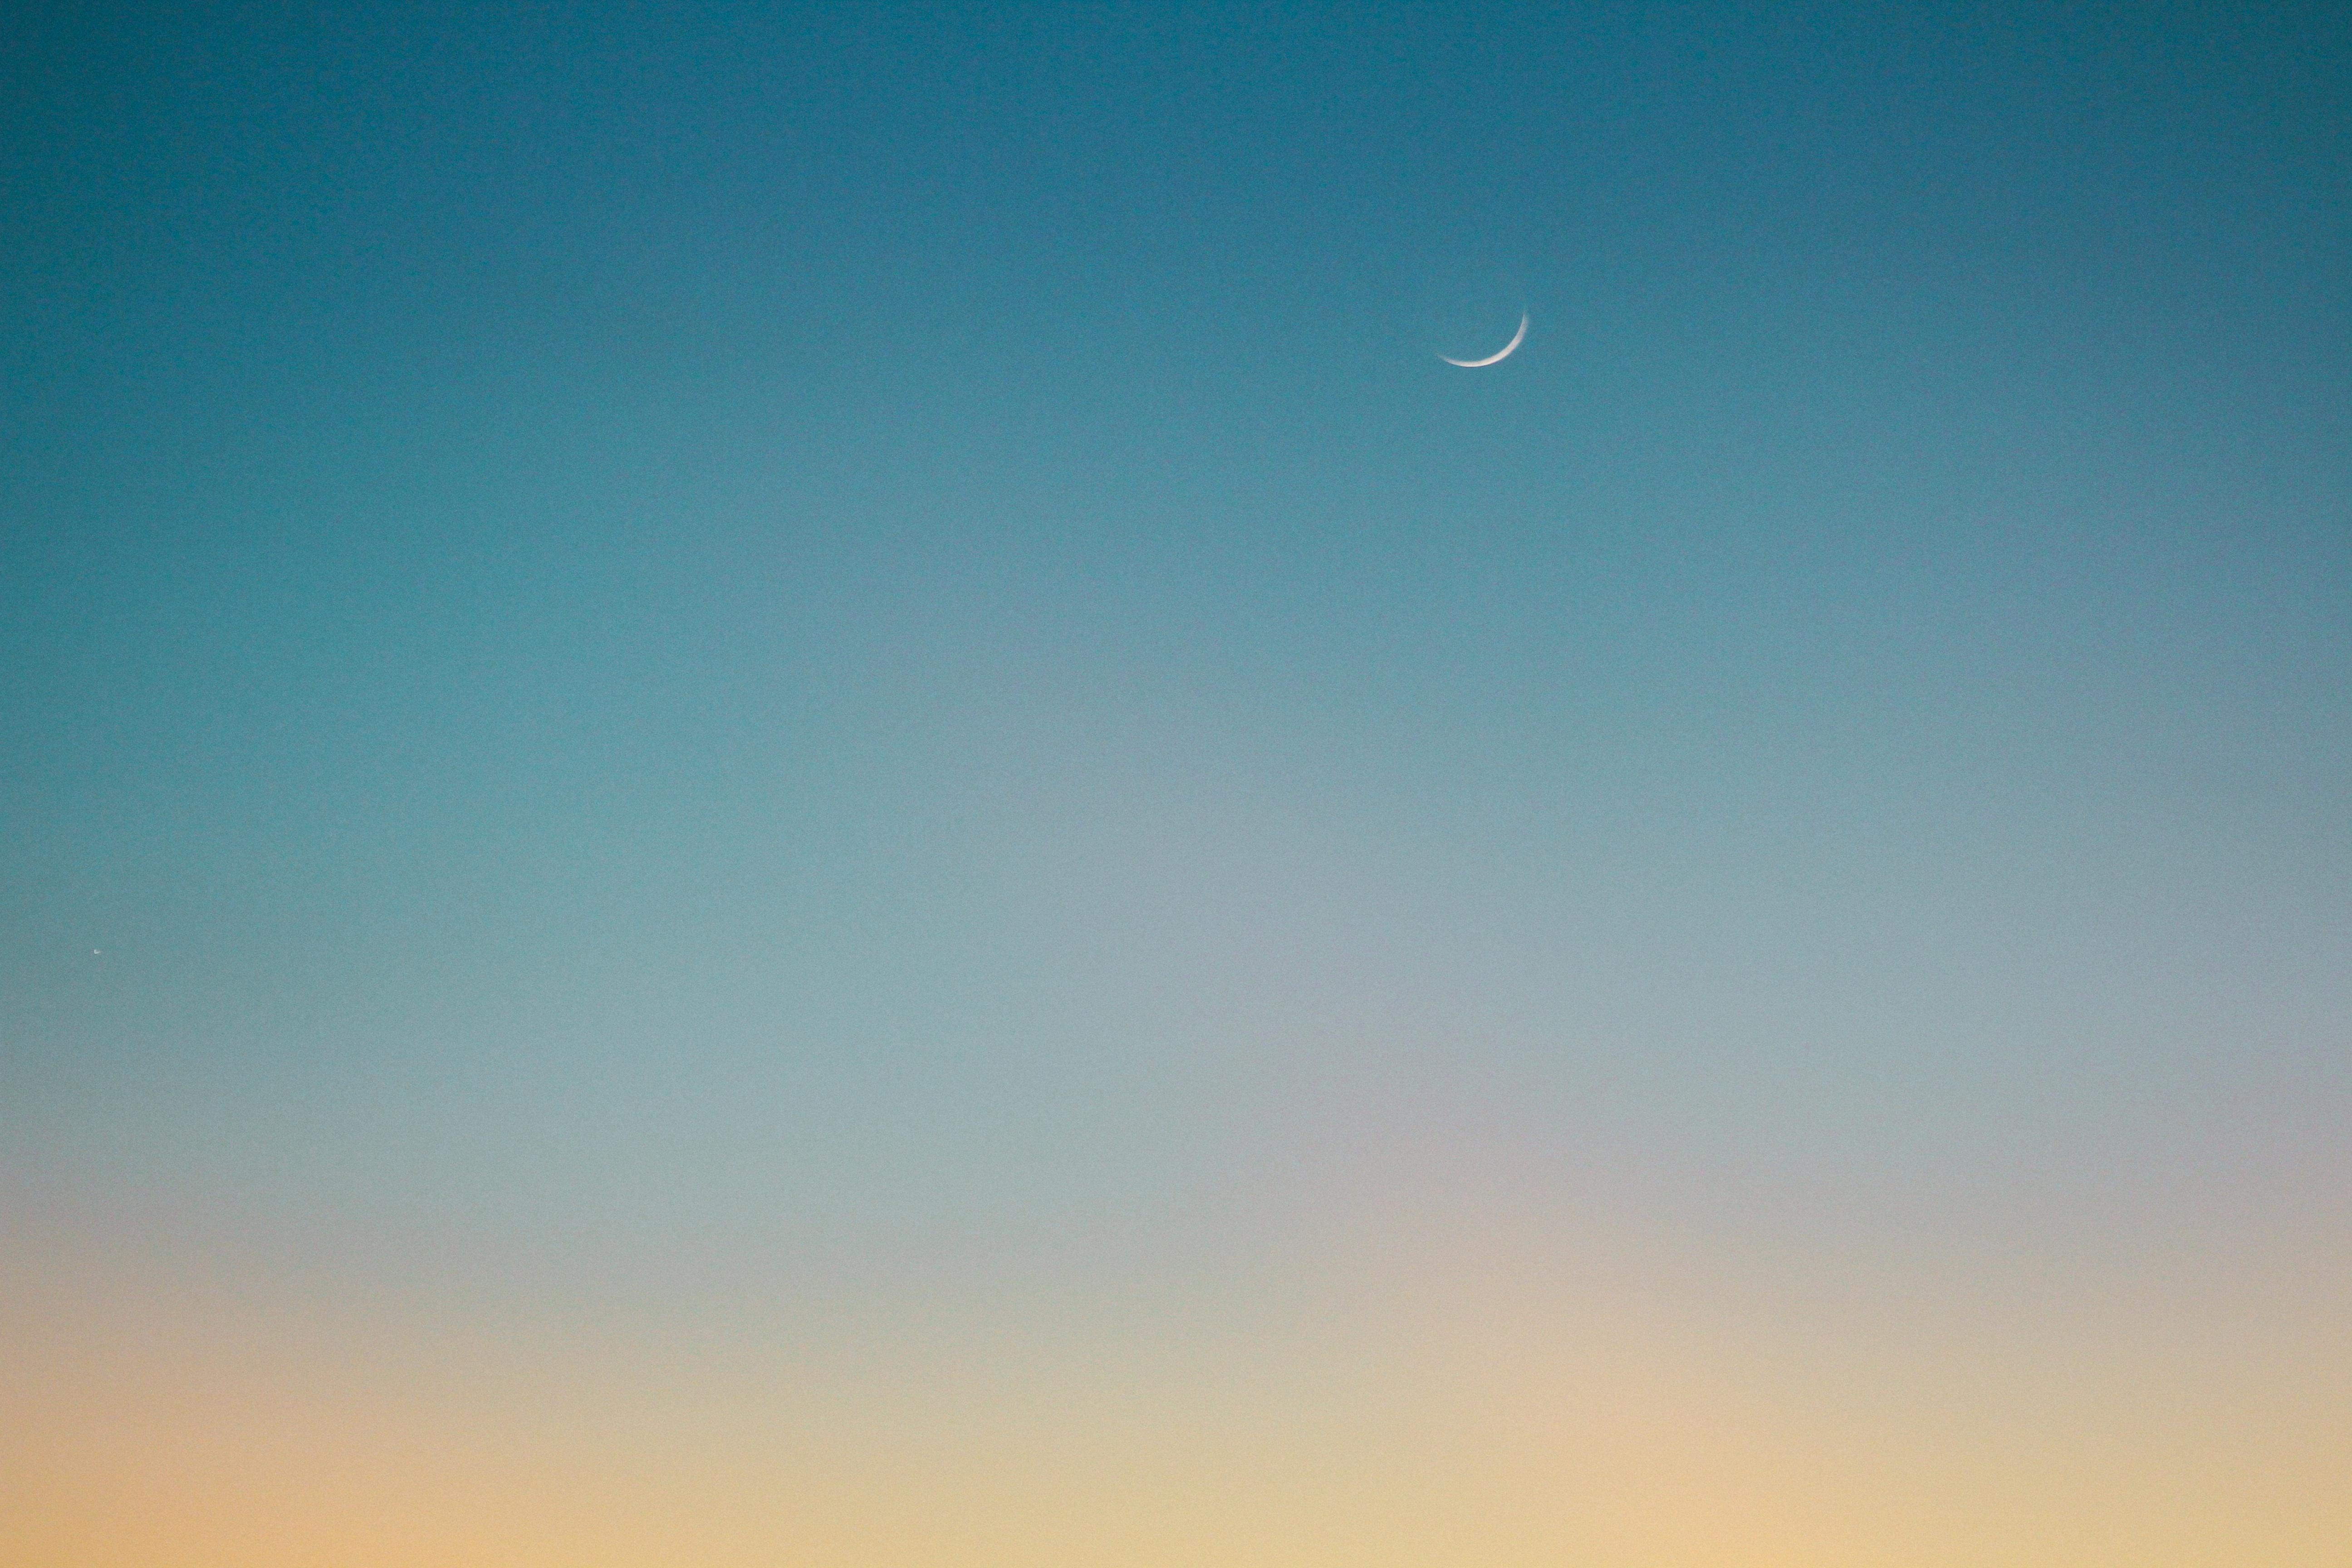 Gambar Horison Awan Langit Matahari Terbit Sinar Matahari